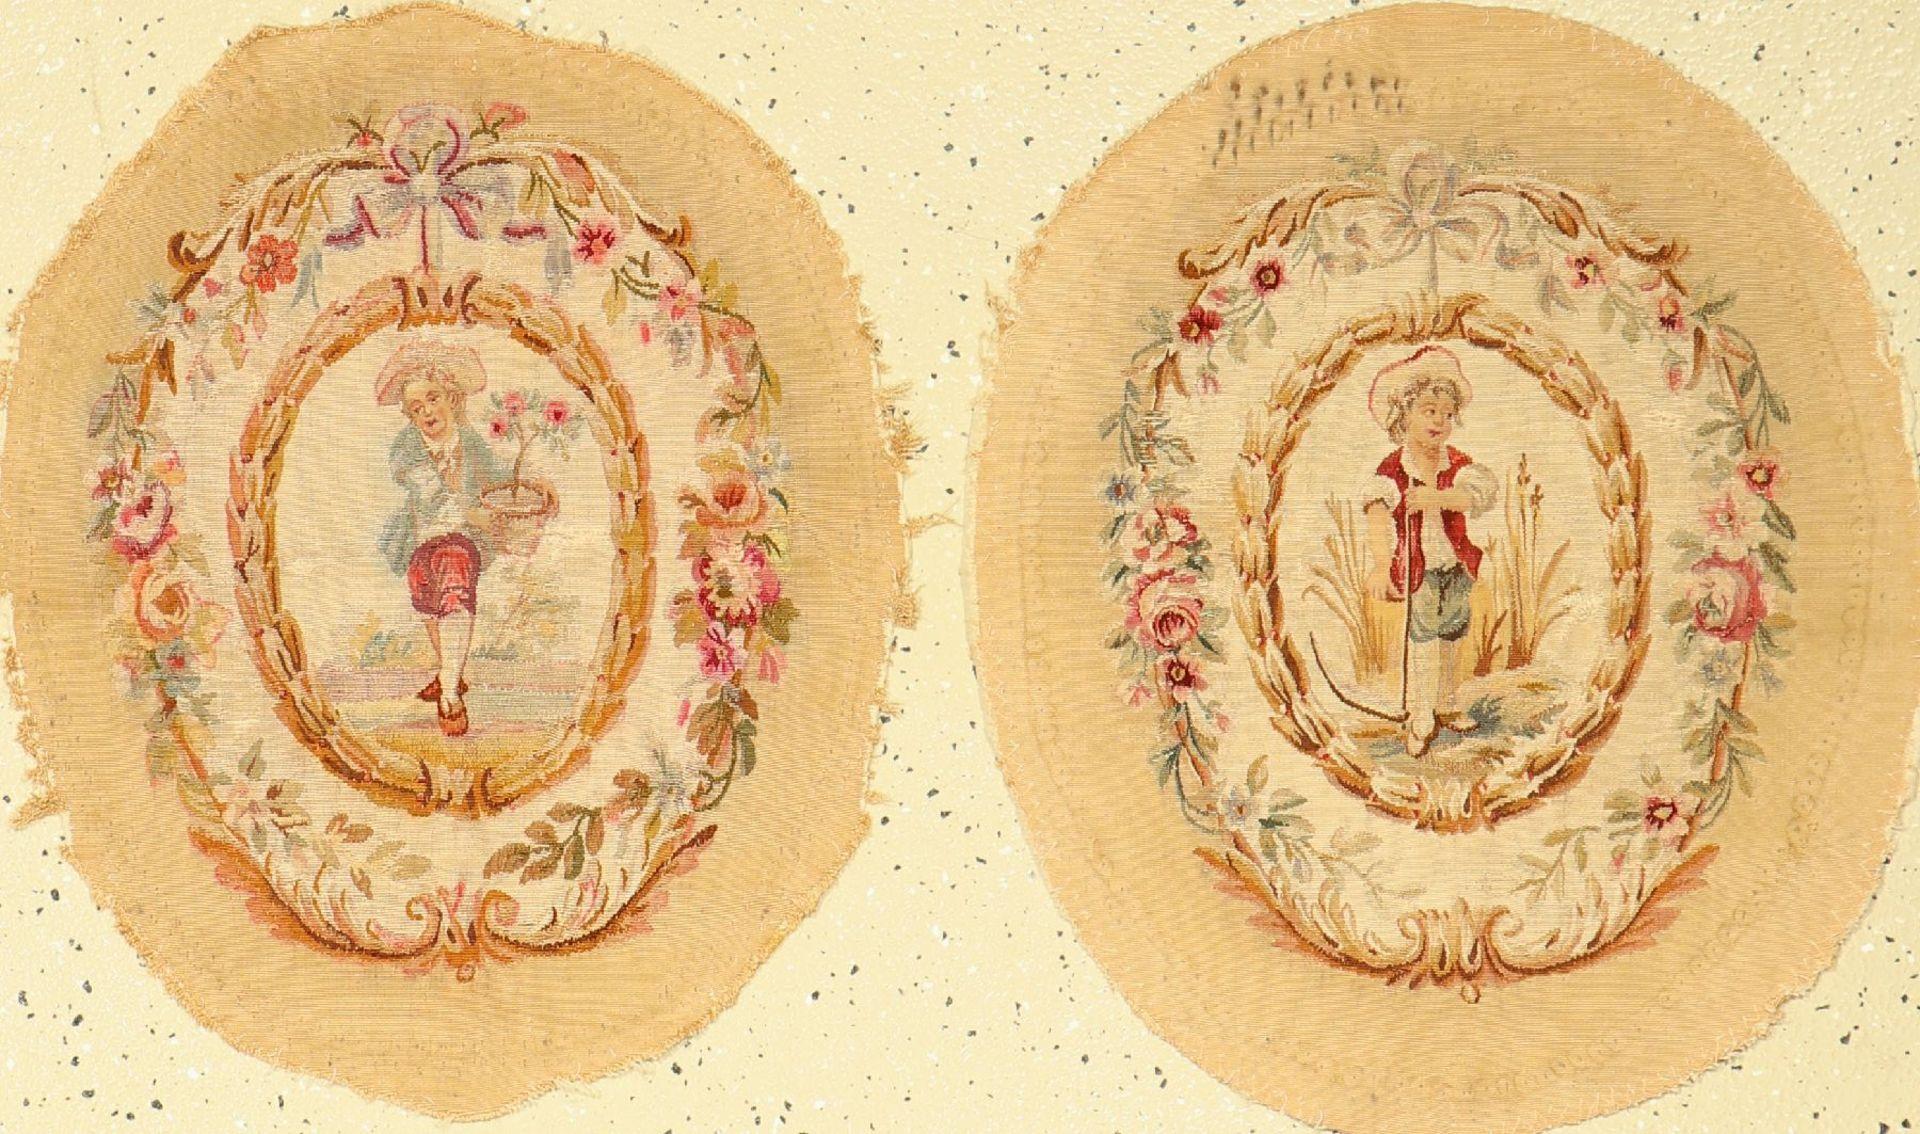 1 Paar Aubosson Seide antik, Frankreich, 19.Jhd., Seide, ca. 57 x 47 cm, EHZ: 4